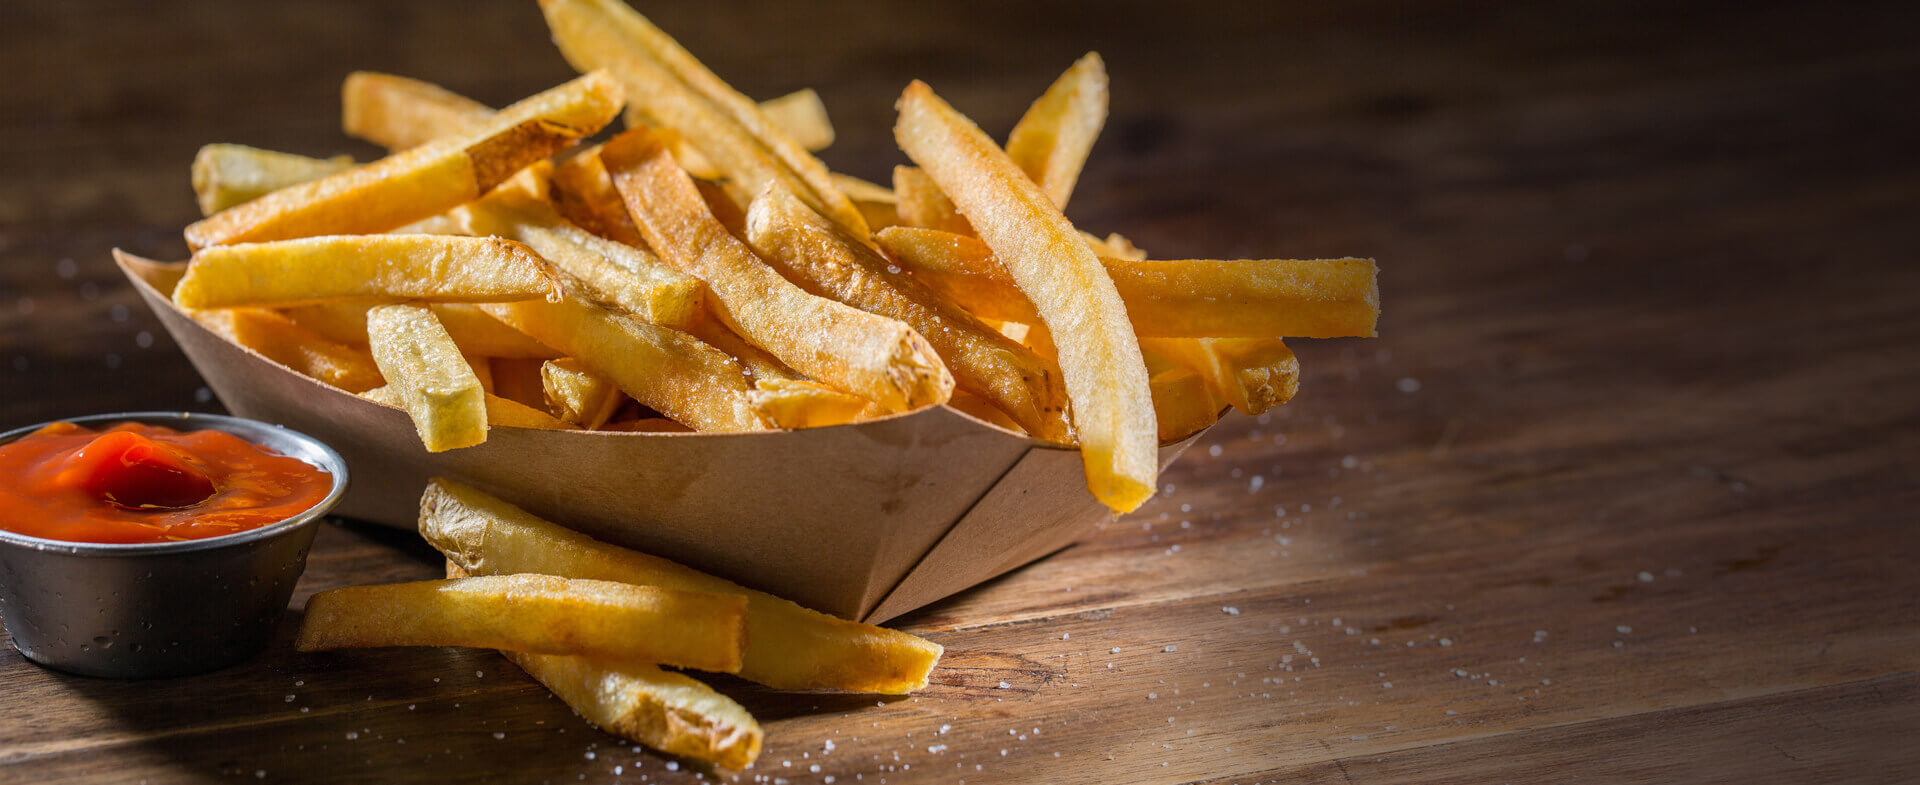 Wayback Burgers Fries